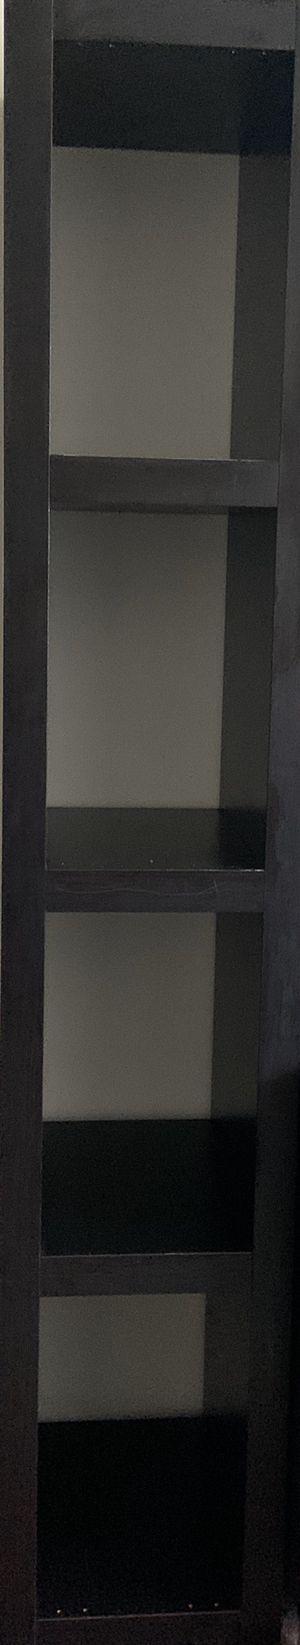 Shelf for Sale in Bloomingdale, IL